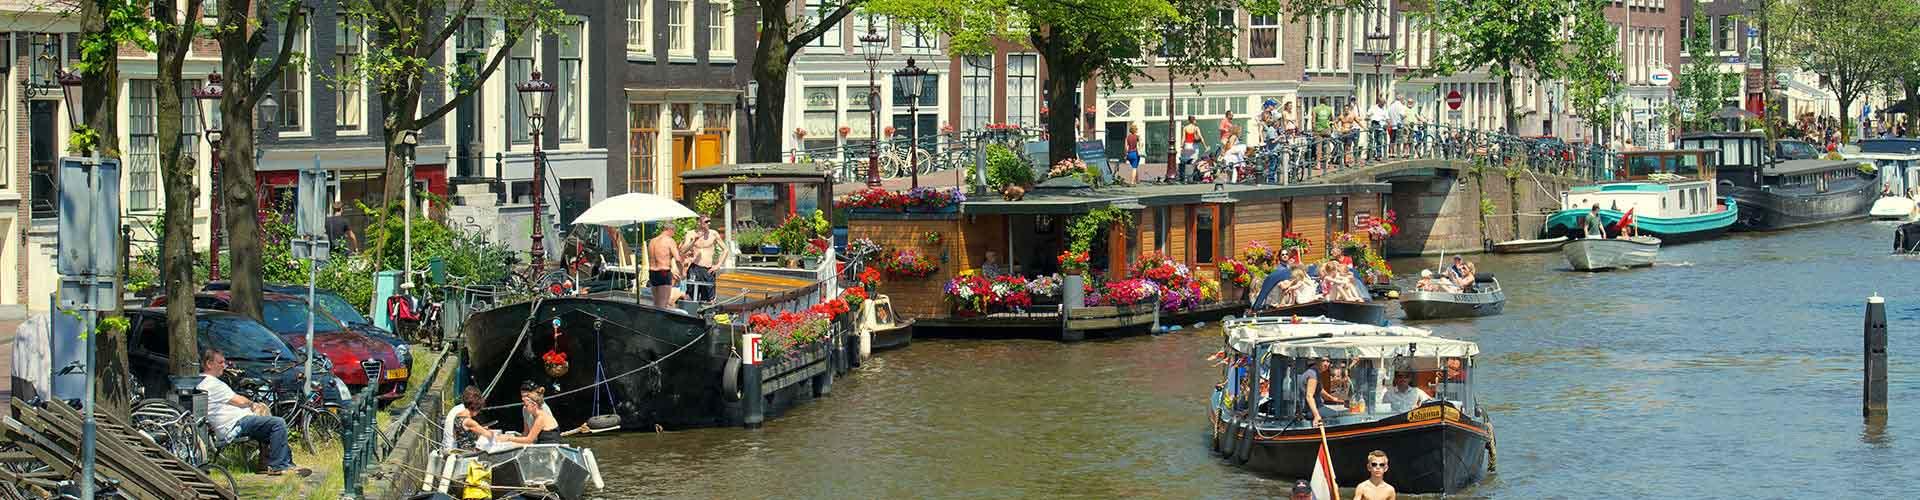 Amsterodam - Hostelů ve čtvrti Amsterdam Centrum. Mapy pro Amsterodam, fotky a recenze pro každý hostel v Amsterodam.